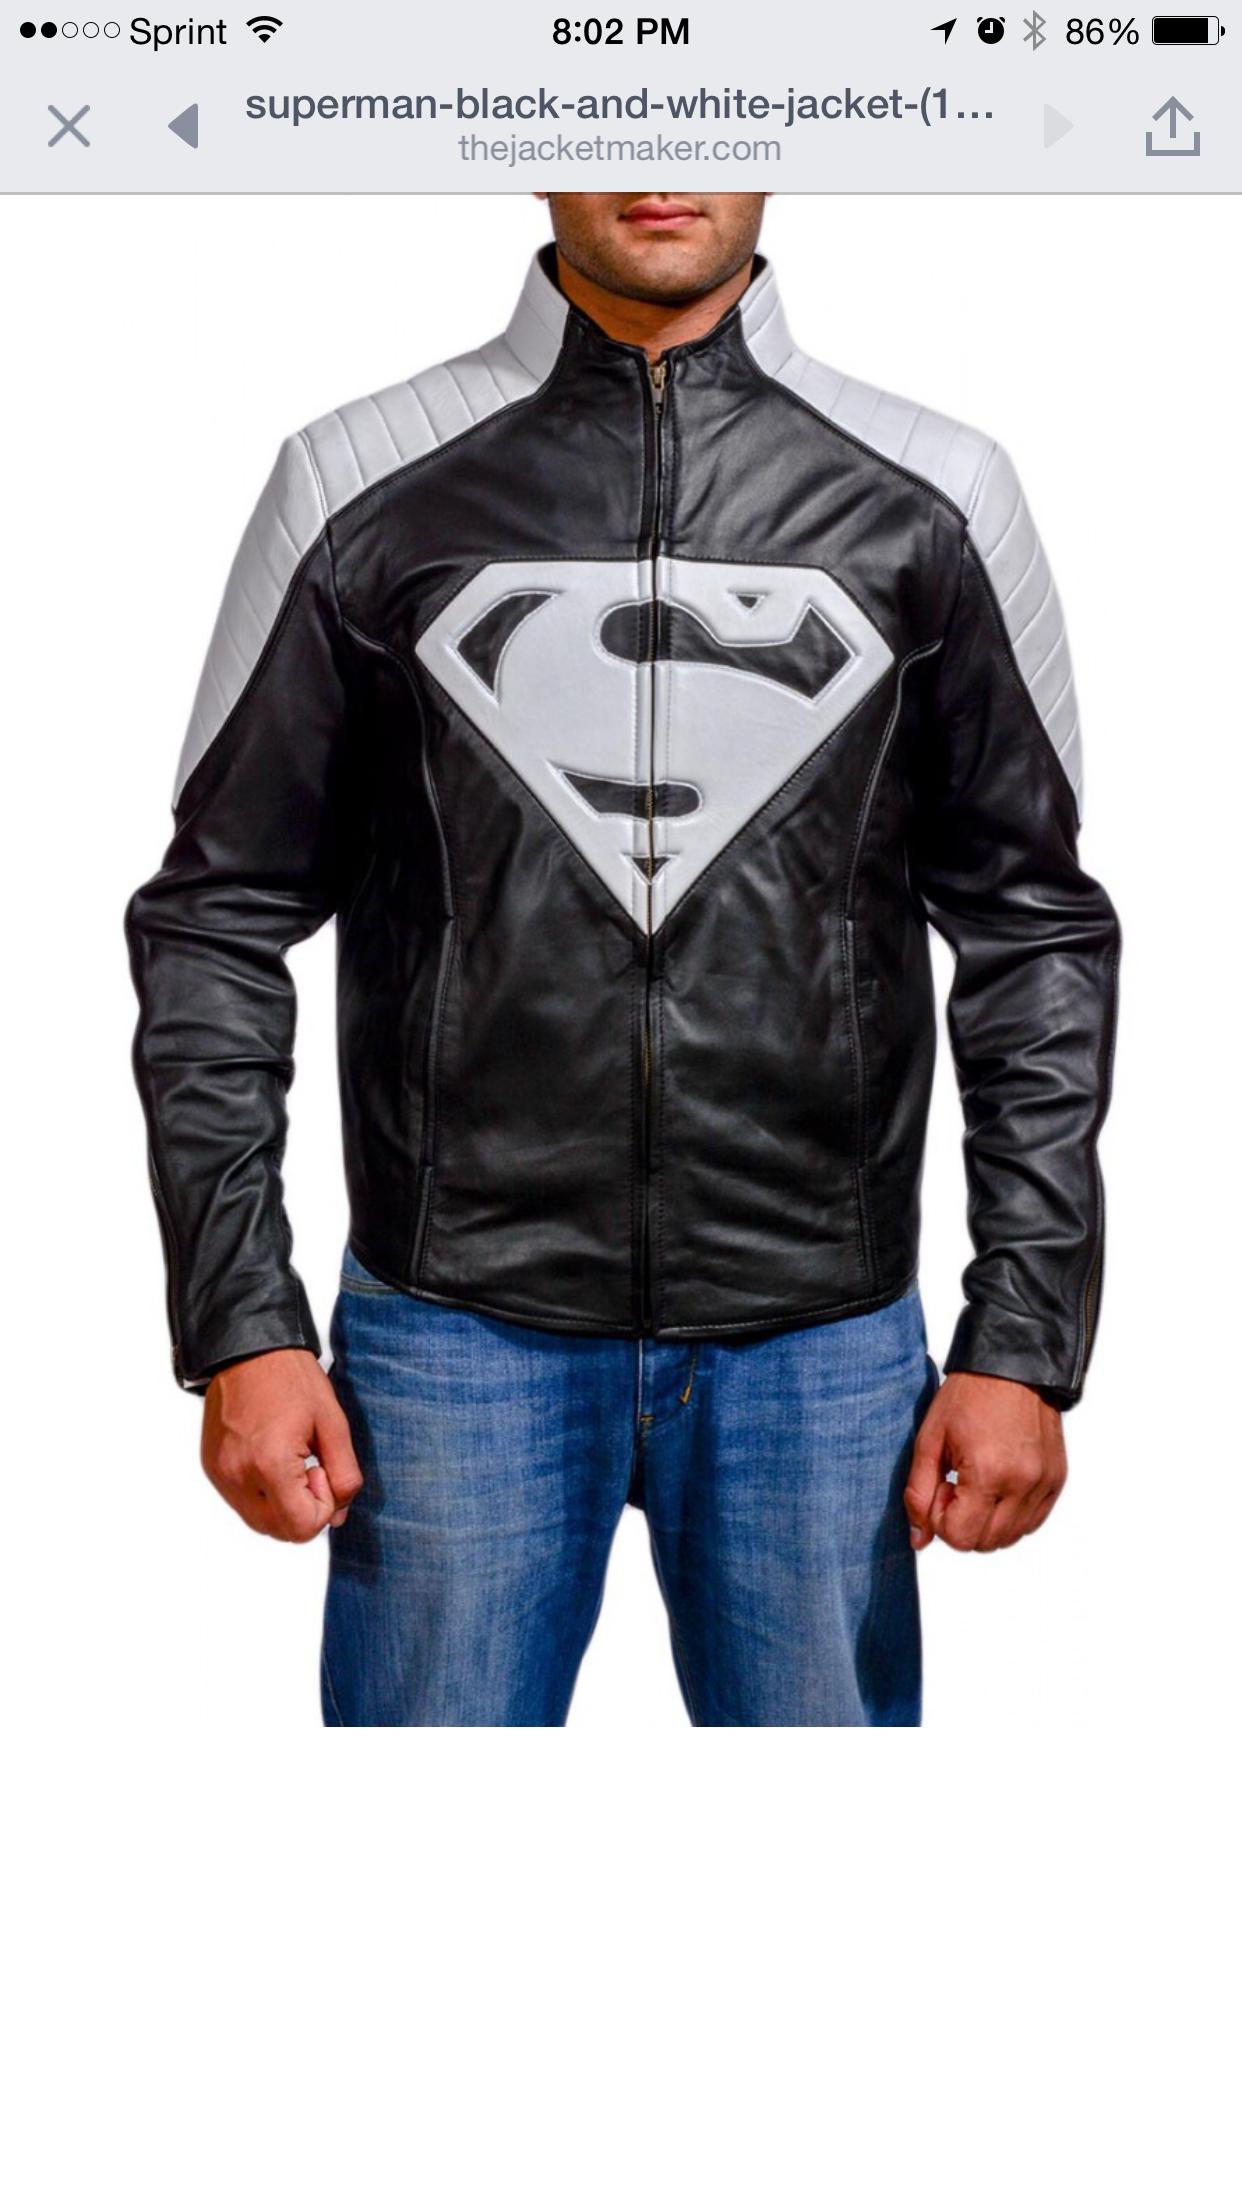 Pin by Sean Pabon on My stuff Leather jacket, White